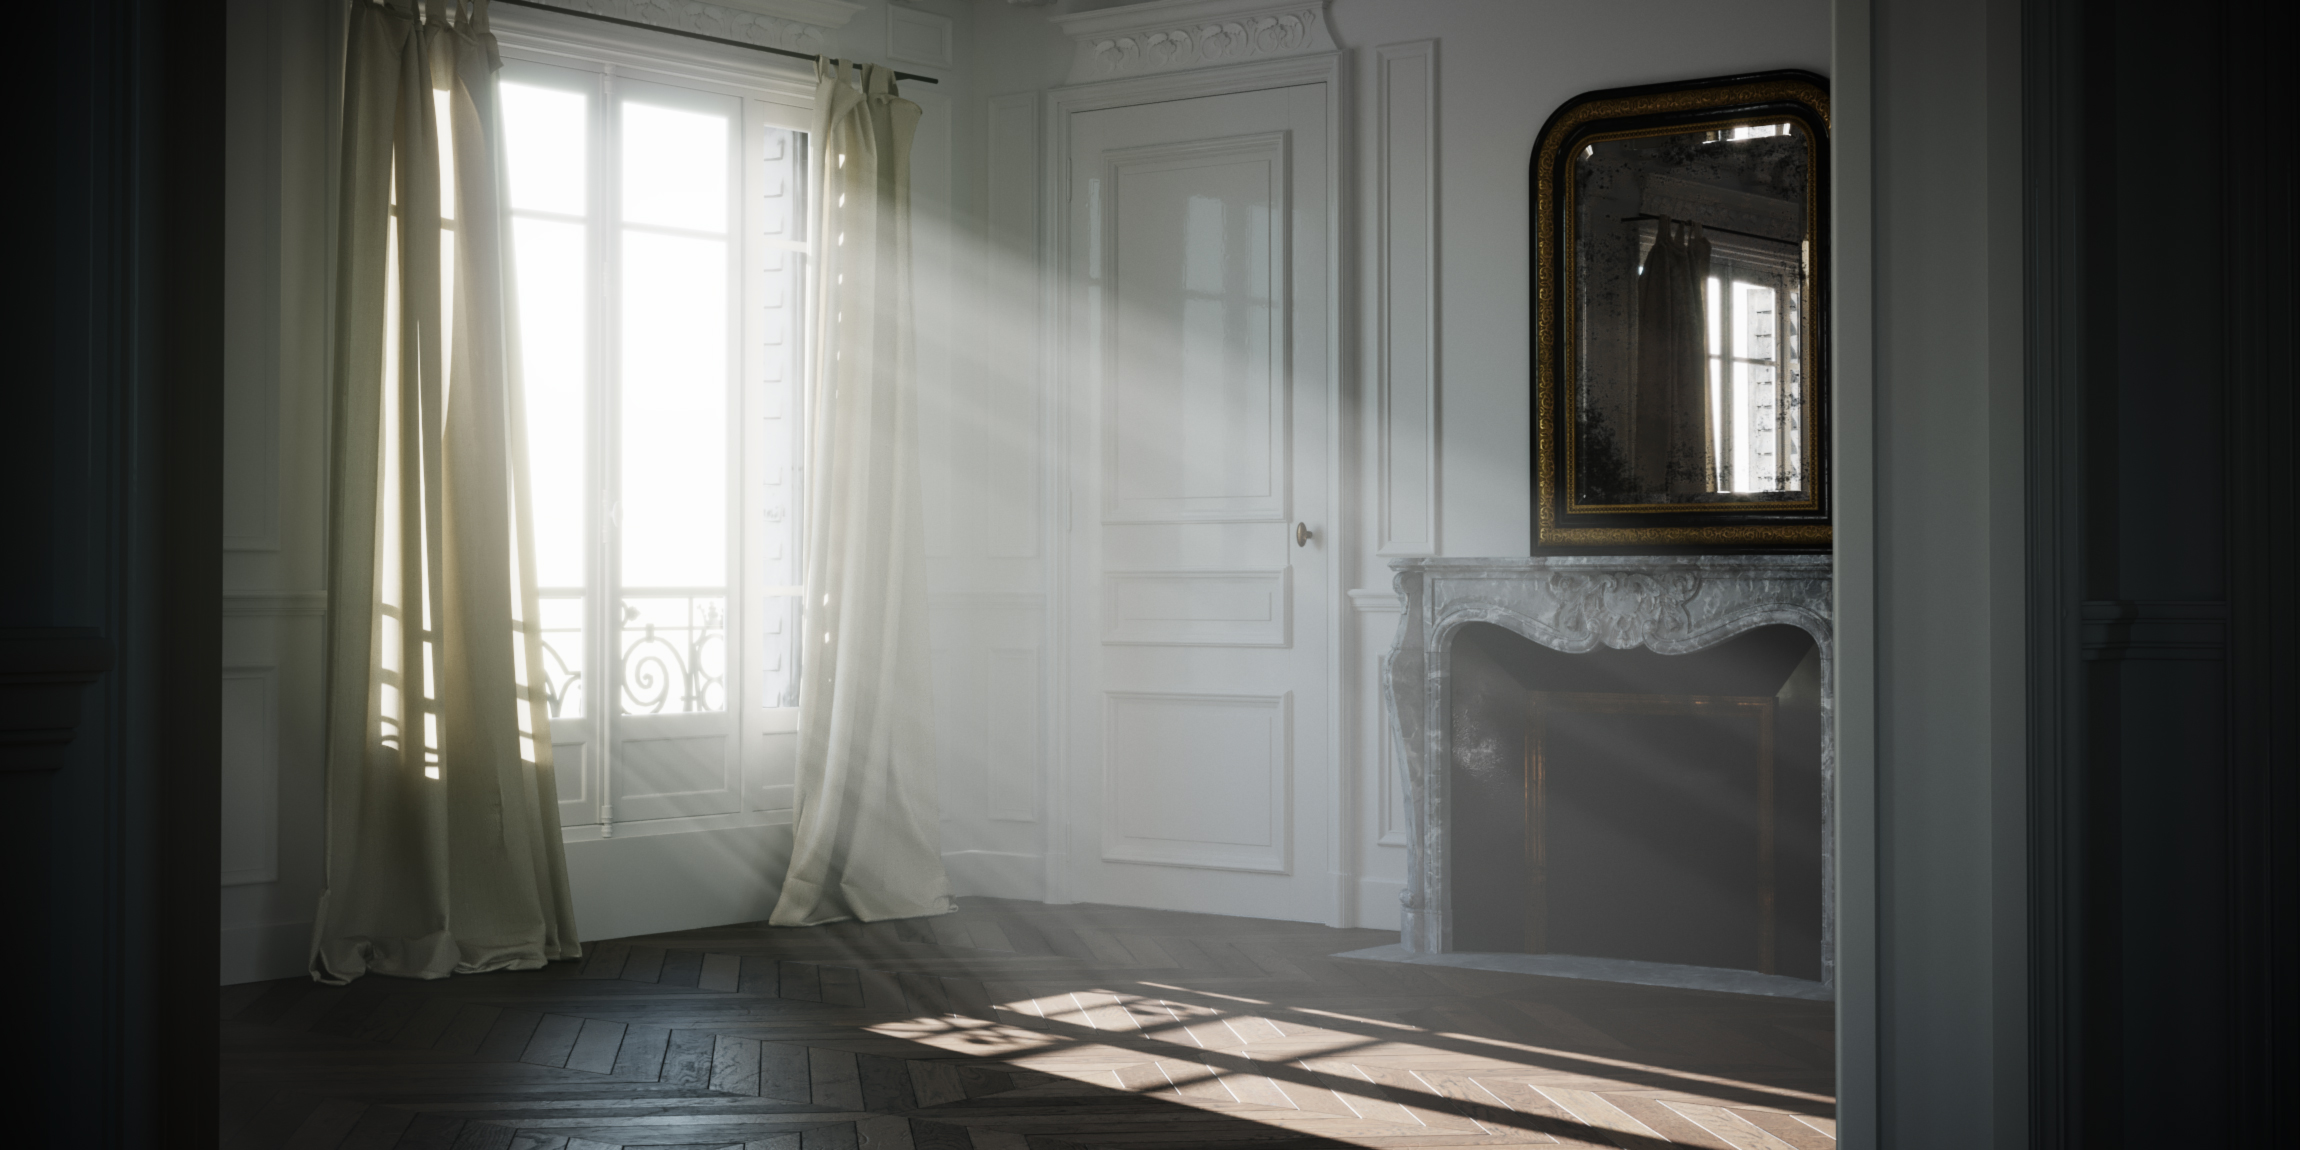 Parisian_Interior_01.jpg